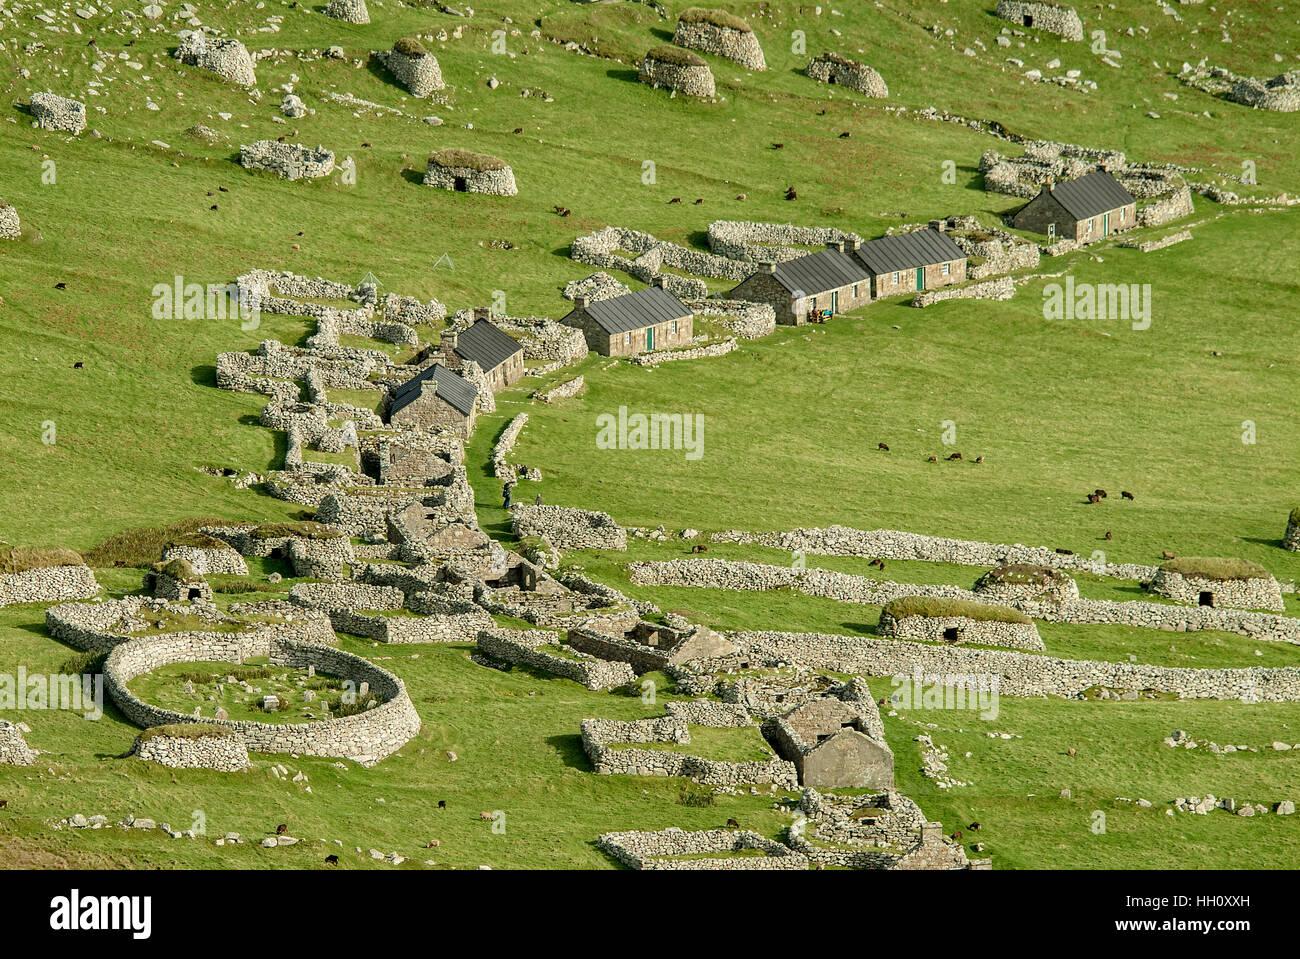 Aerial view of Hirta village street and circular graveyard, St.Kilda, Outer Hebrides, Scotland UK - Stock Image